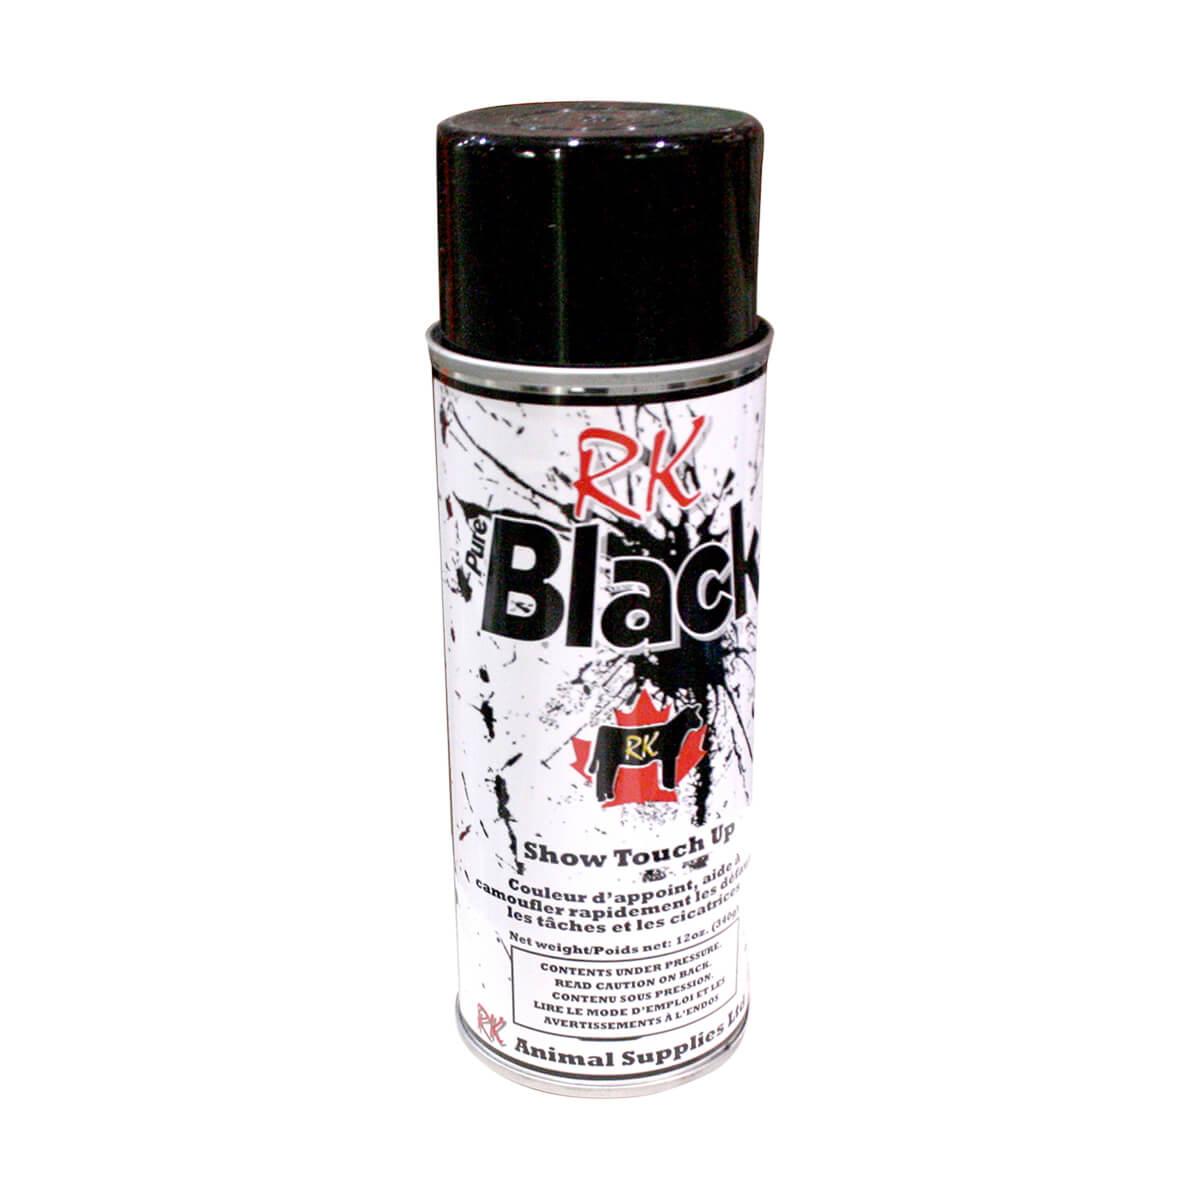 Sullivan's Pure Touch Up - Black